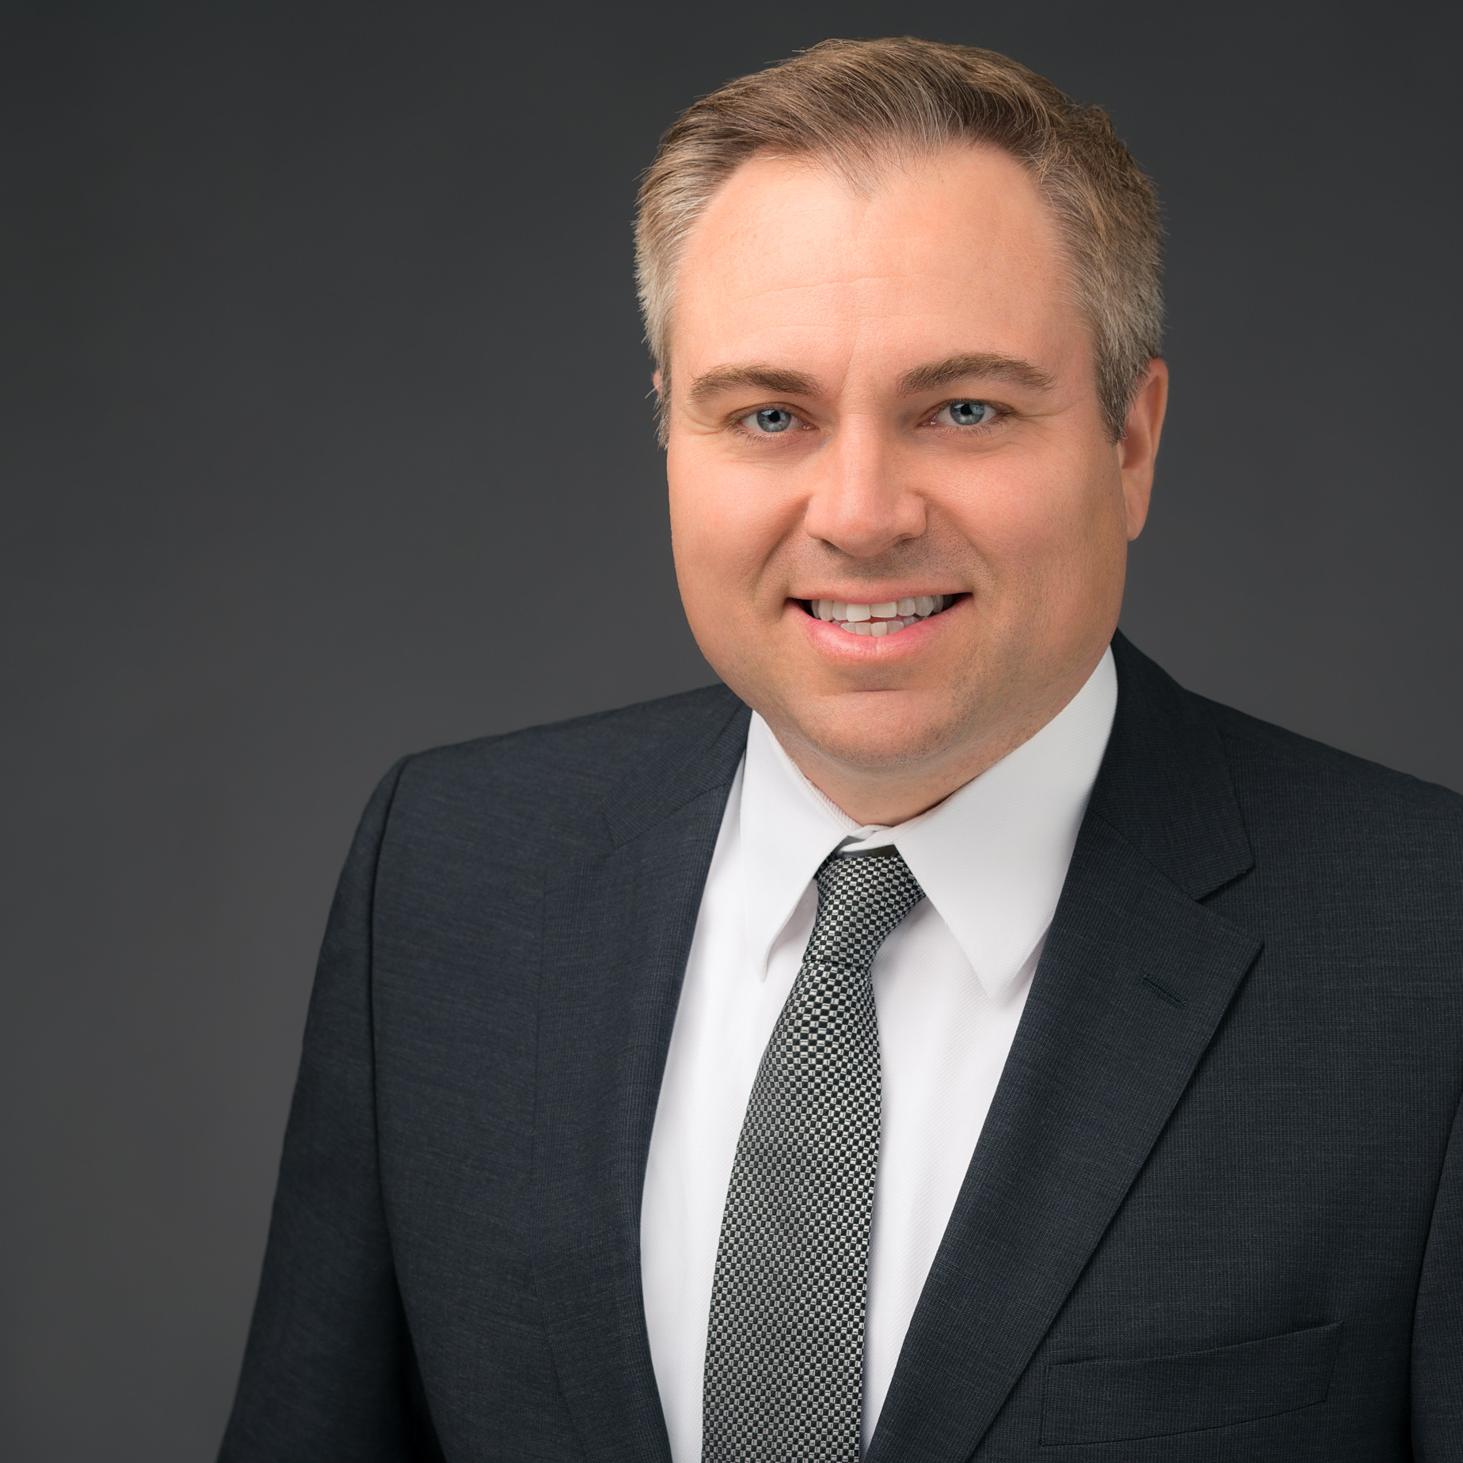 Brad Berner, VP, Indirect Procurement at Academy Sports